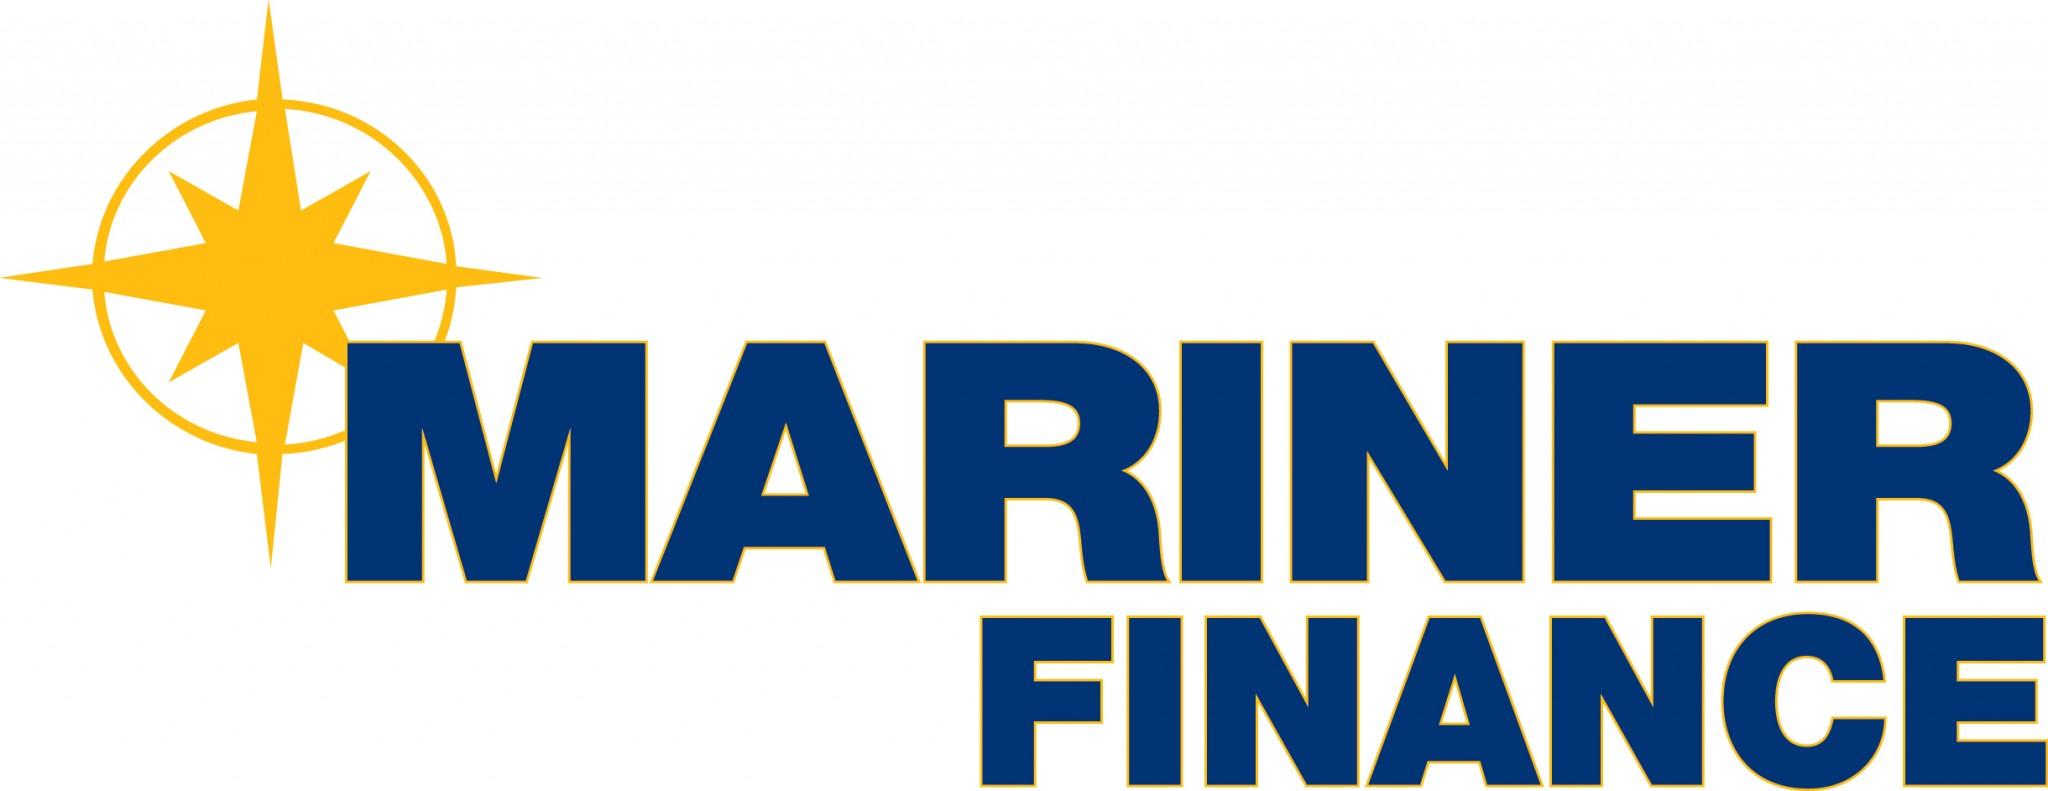 mariner-finance.jpg